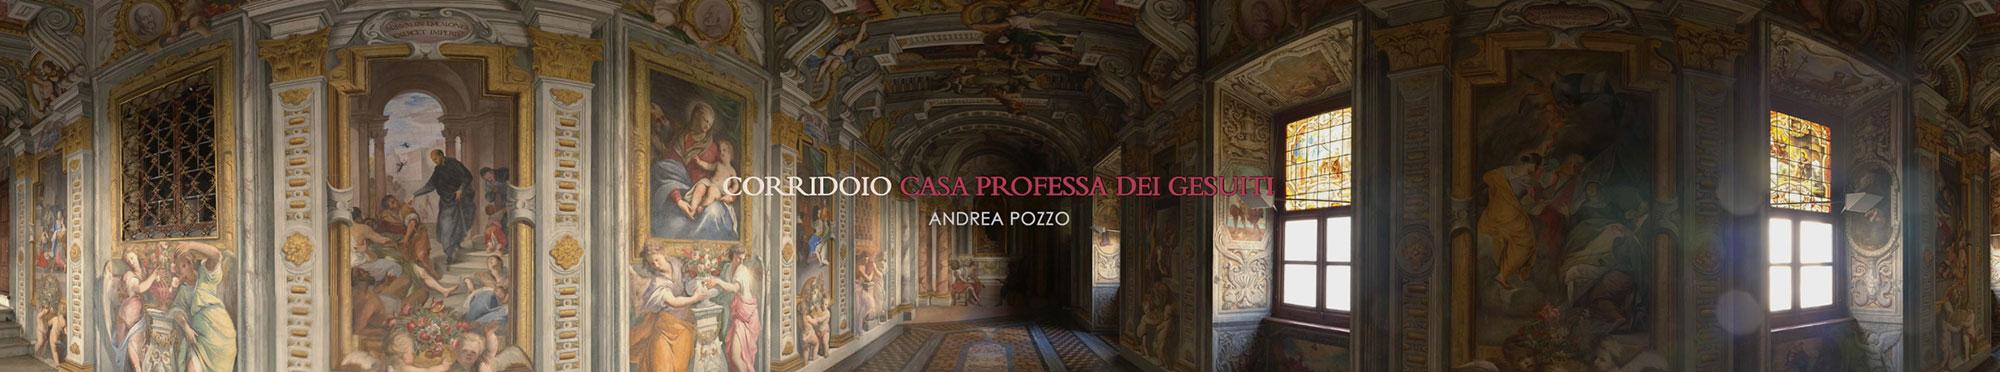 Declinare Roma_Sapienza_ateliercrilo.com_3.jpg